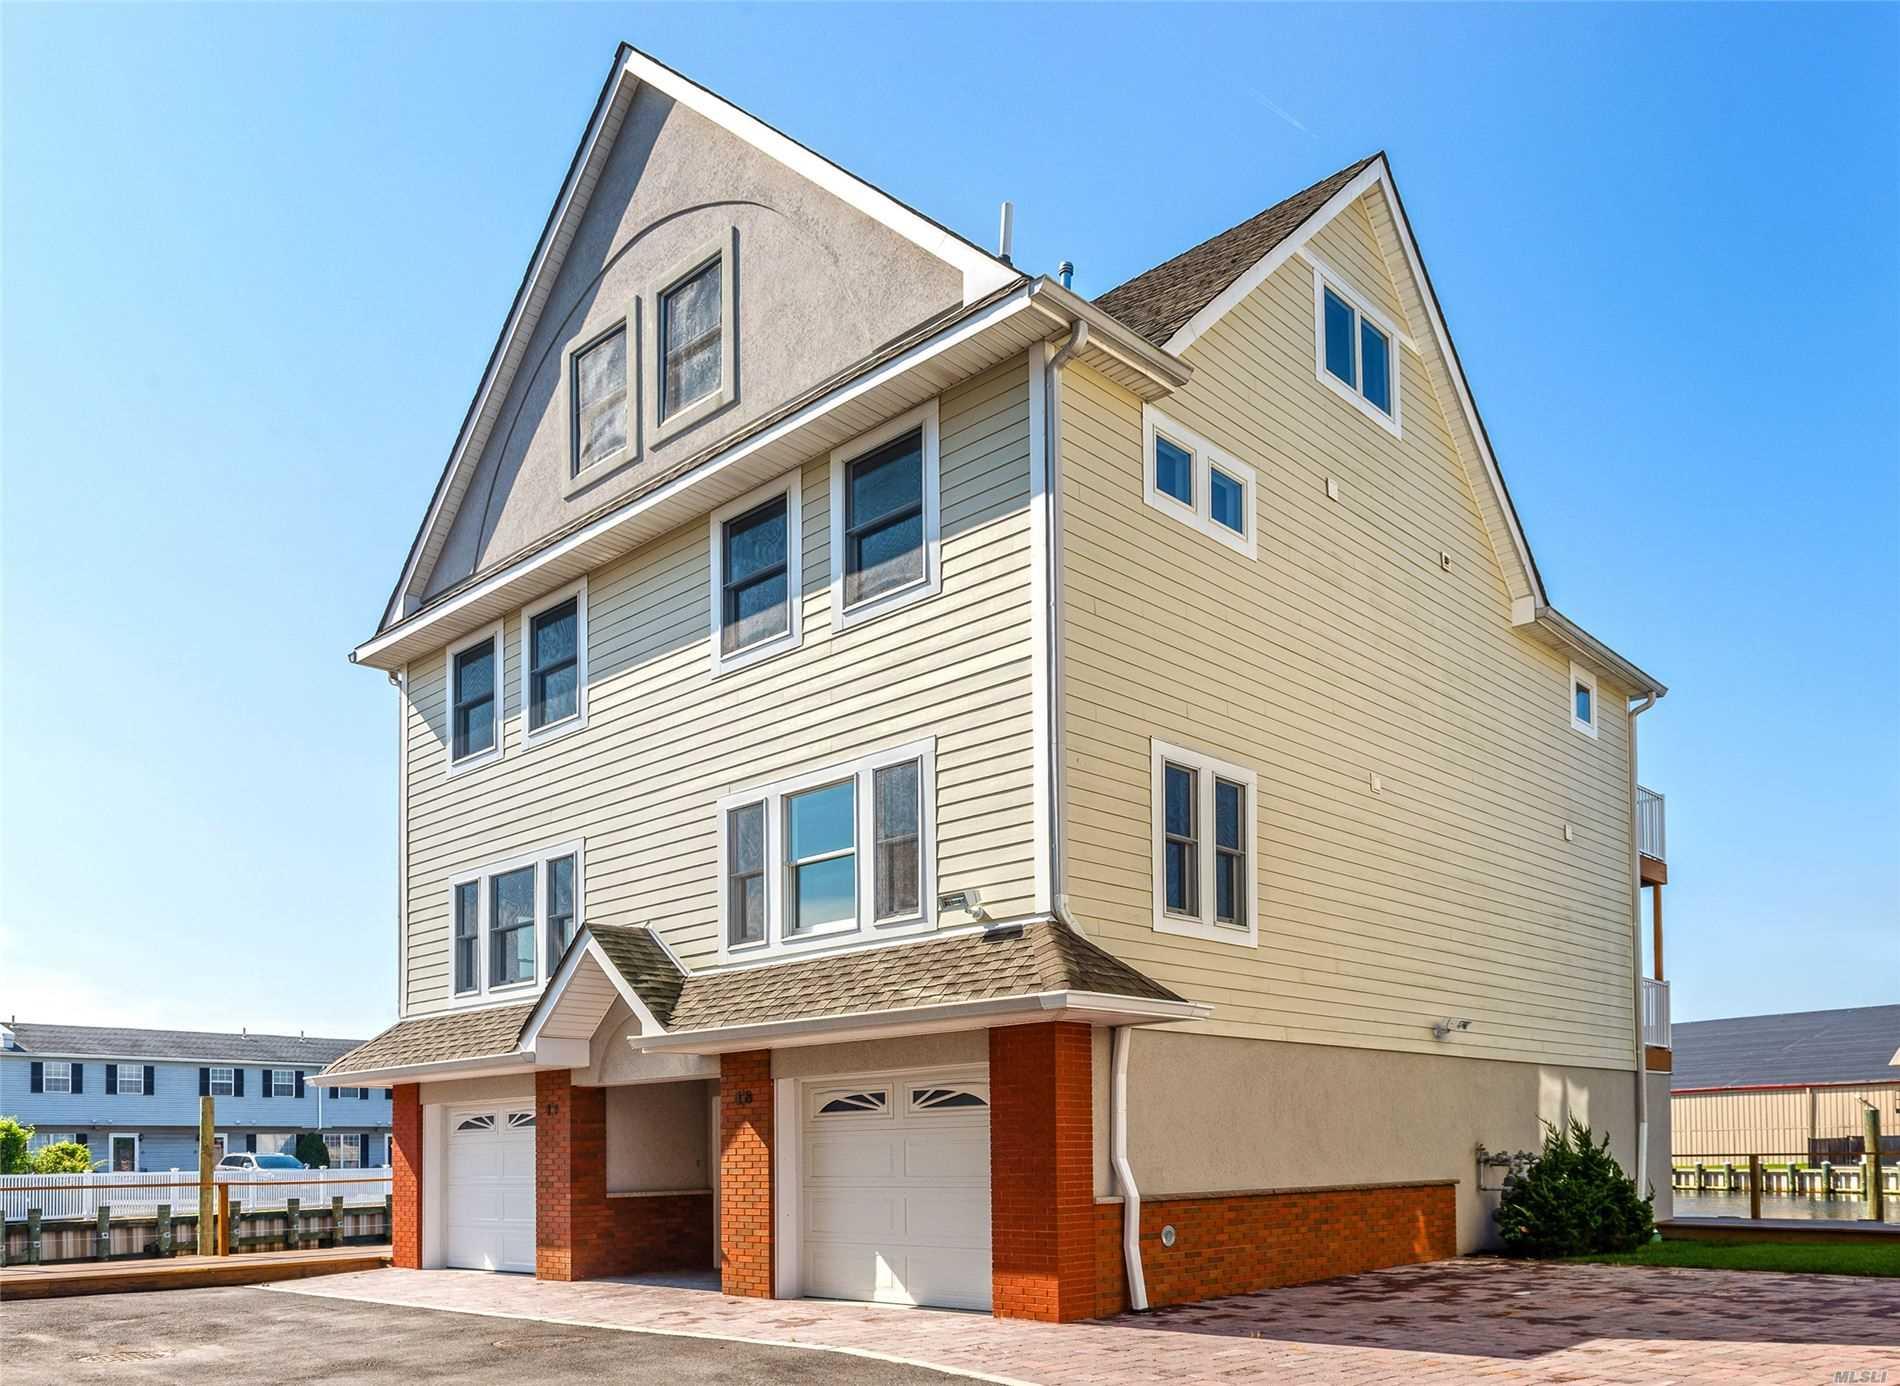 Property for sale at 531 Ray Street # 18, Freeport NY 11520, Freeport,  New York 11520